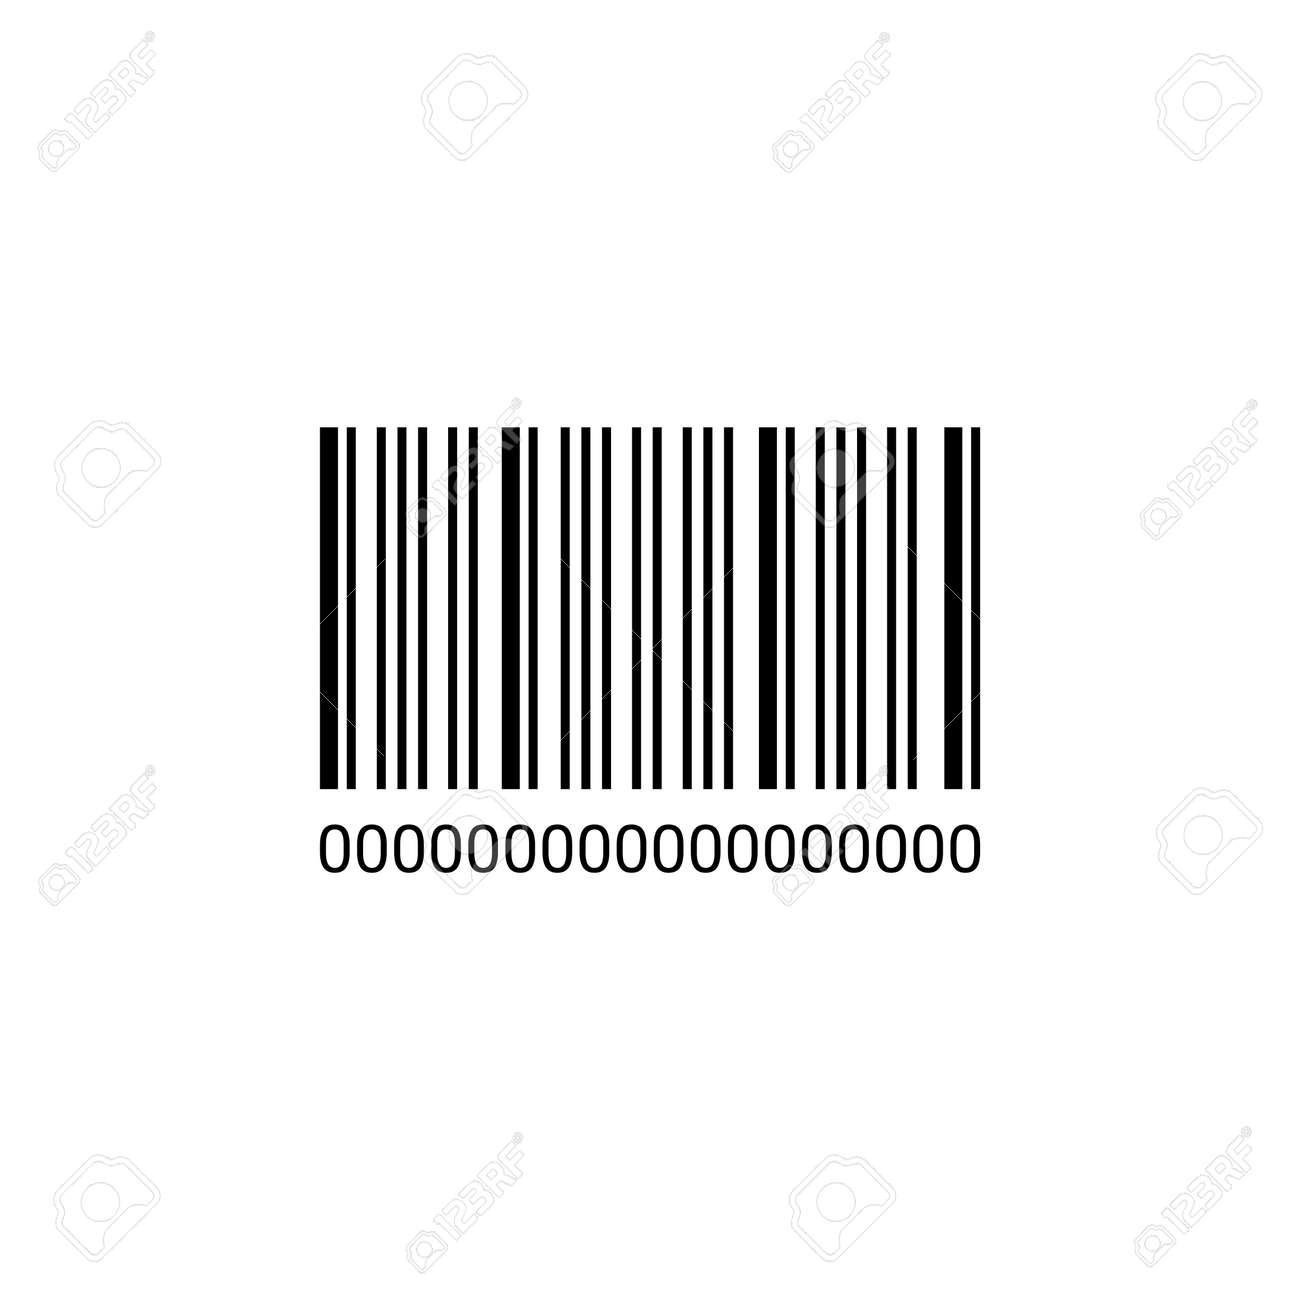 The barcode icon. Identification and ID symbol. Flat illustration. - 168786275